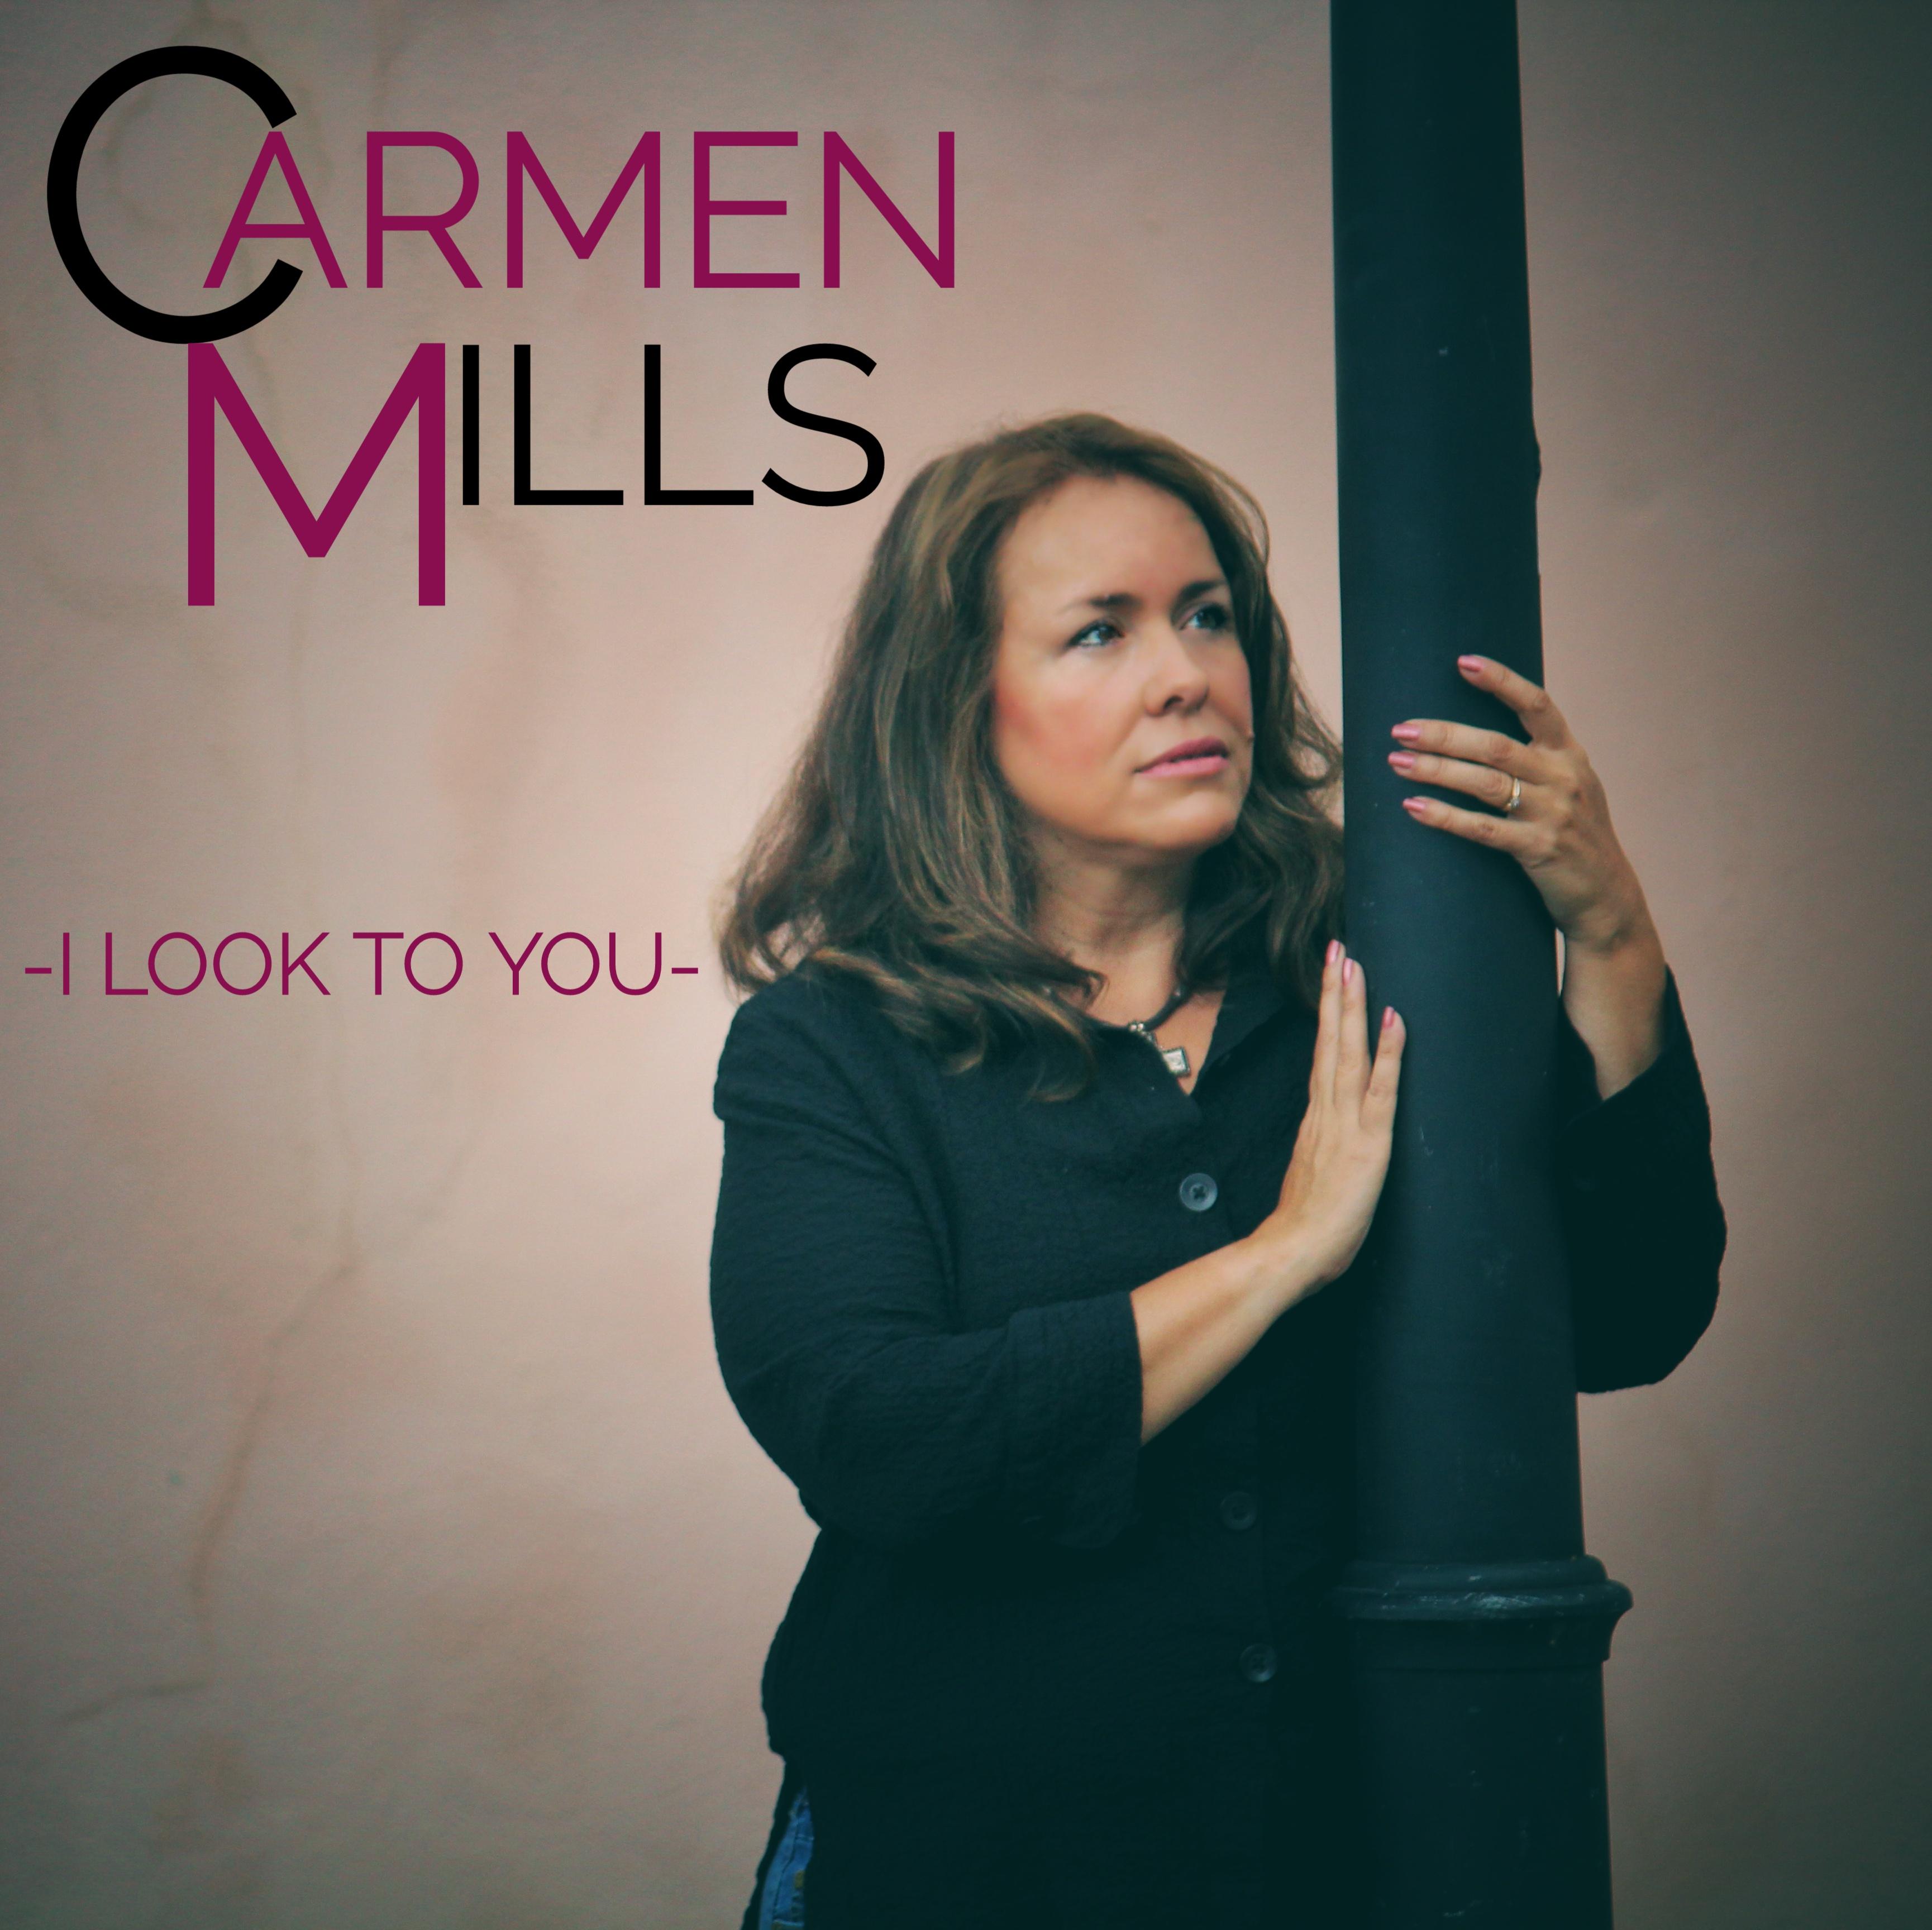 Carmen Mills